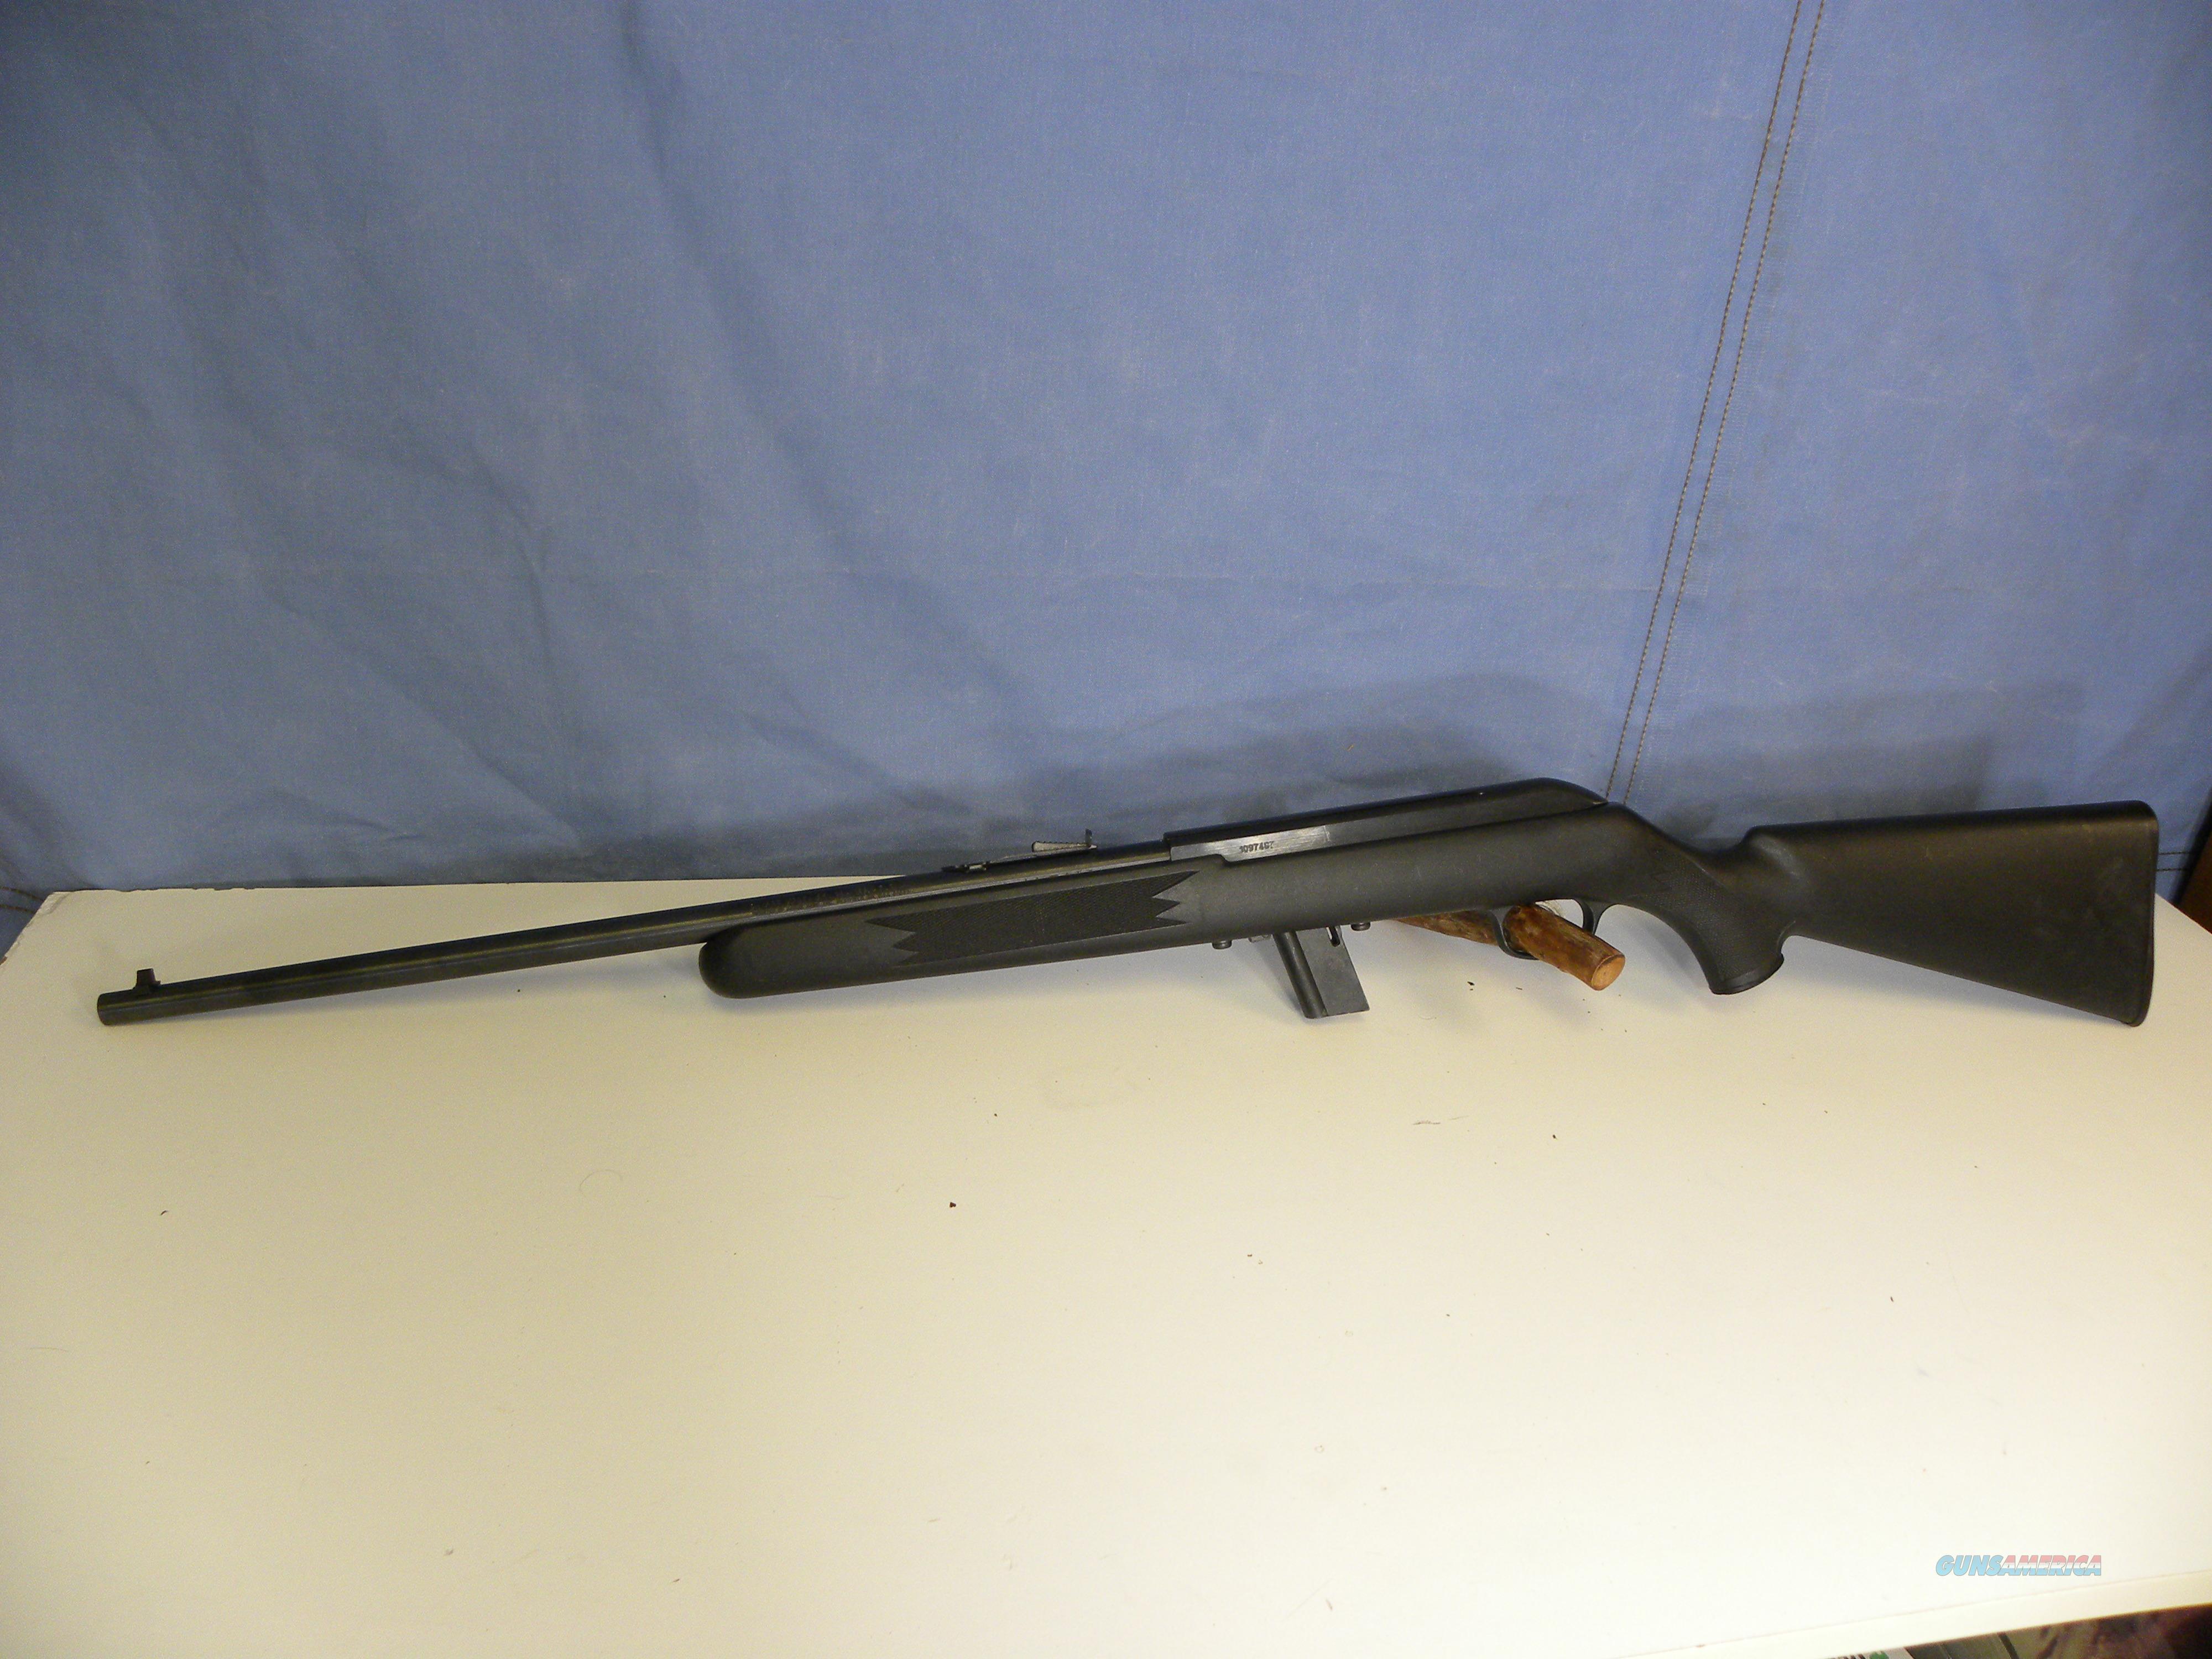 Savage 64 .22 LR  Guns > Rifles > Savage Rifles > Rimfire